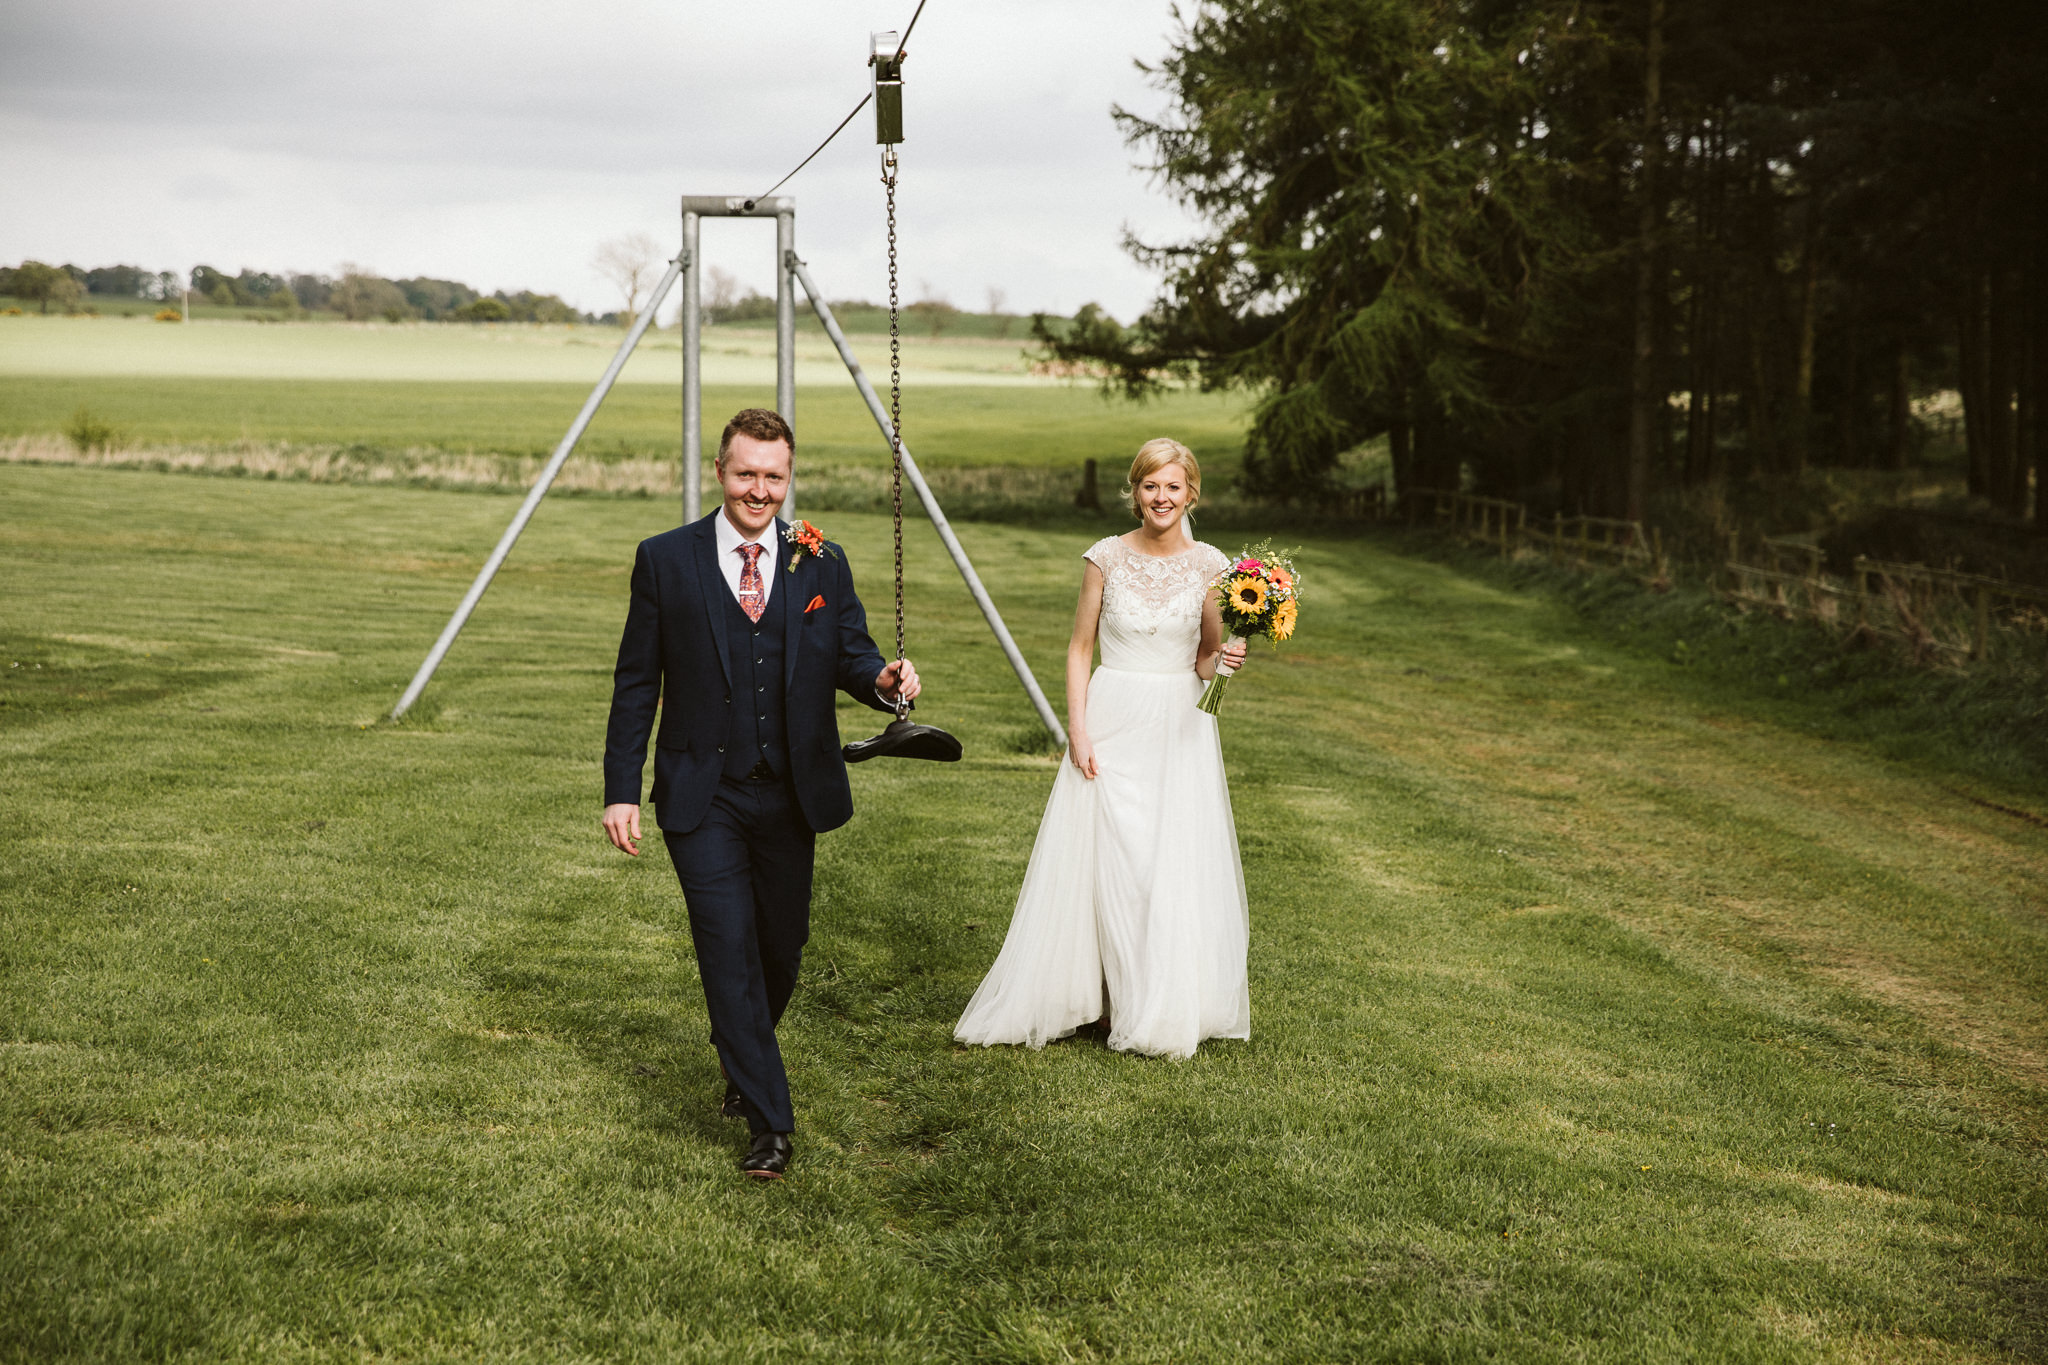 northside-farm-wedding-northumberland-margarita-hope (91).jpg